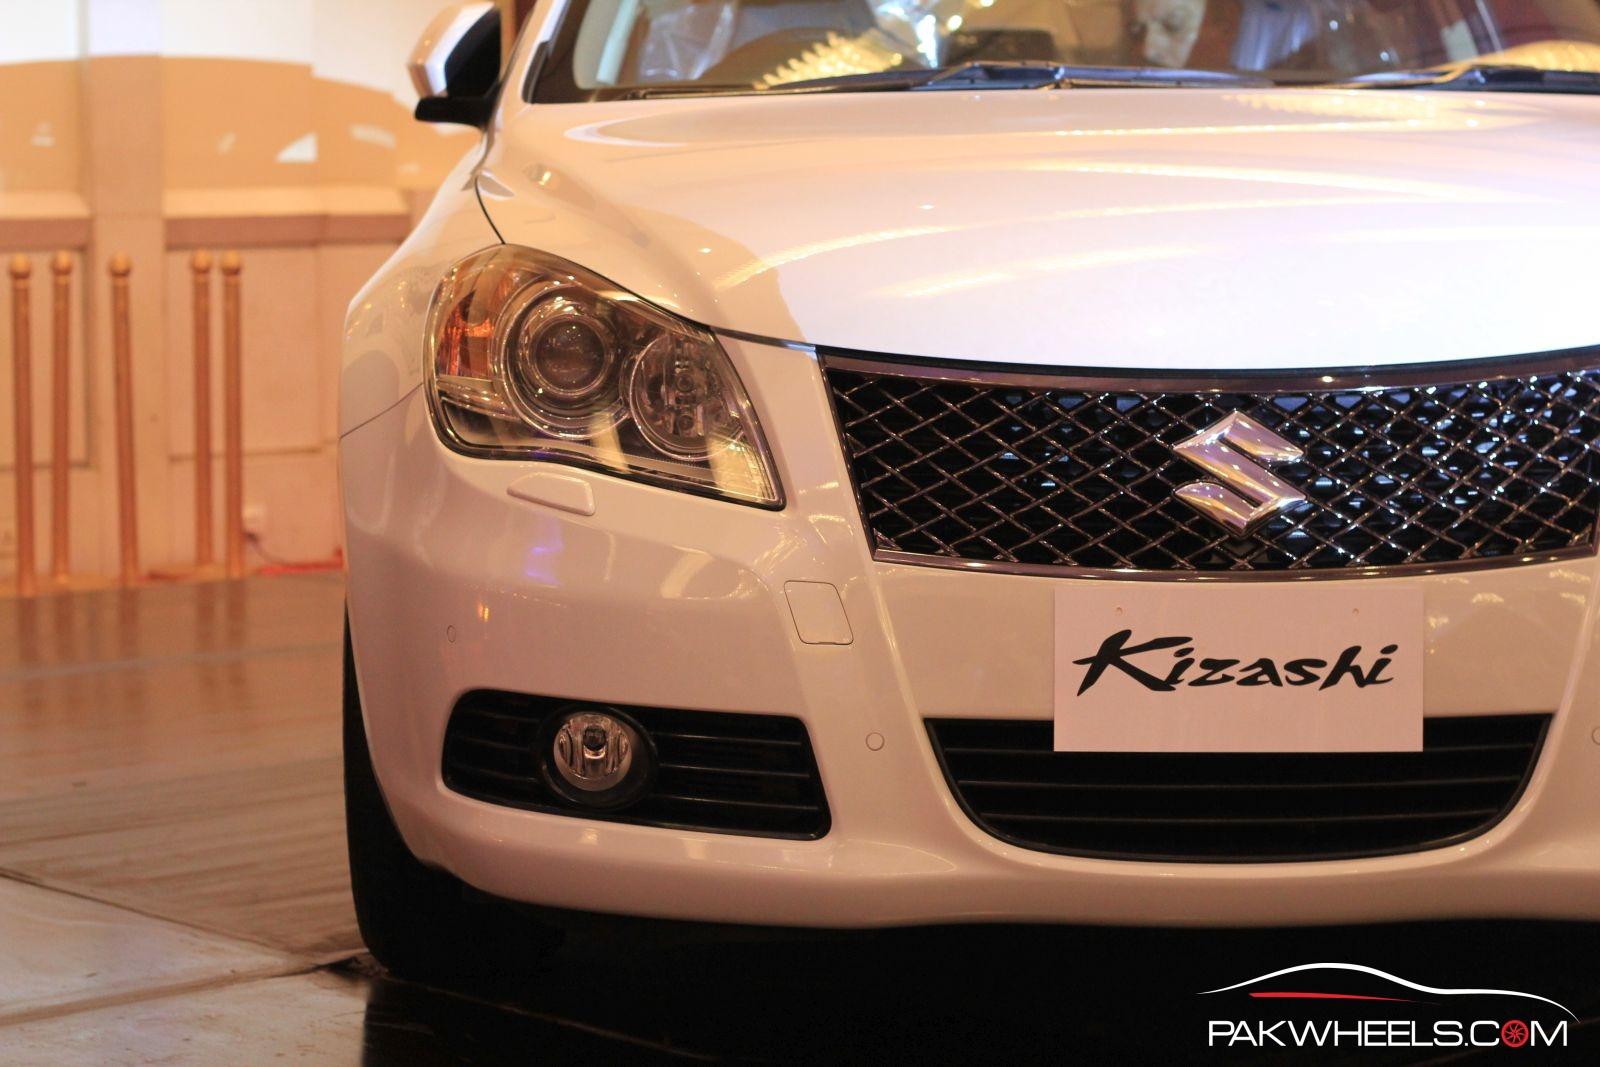 Suzuki Kizashi Officially Launched in Pakistan 33